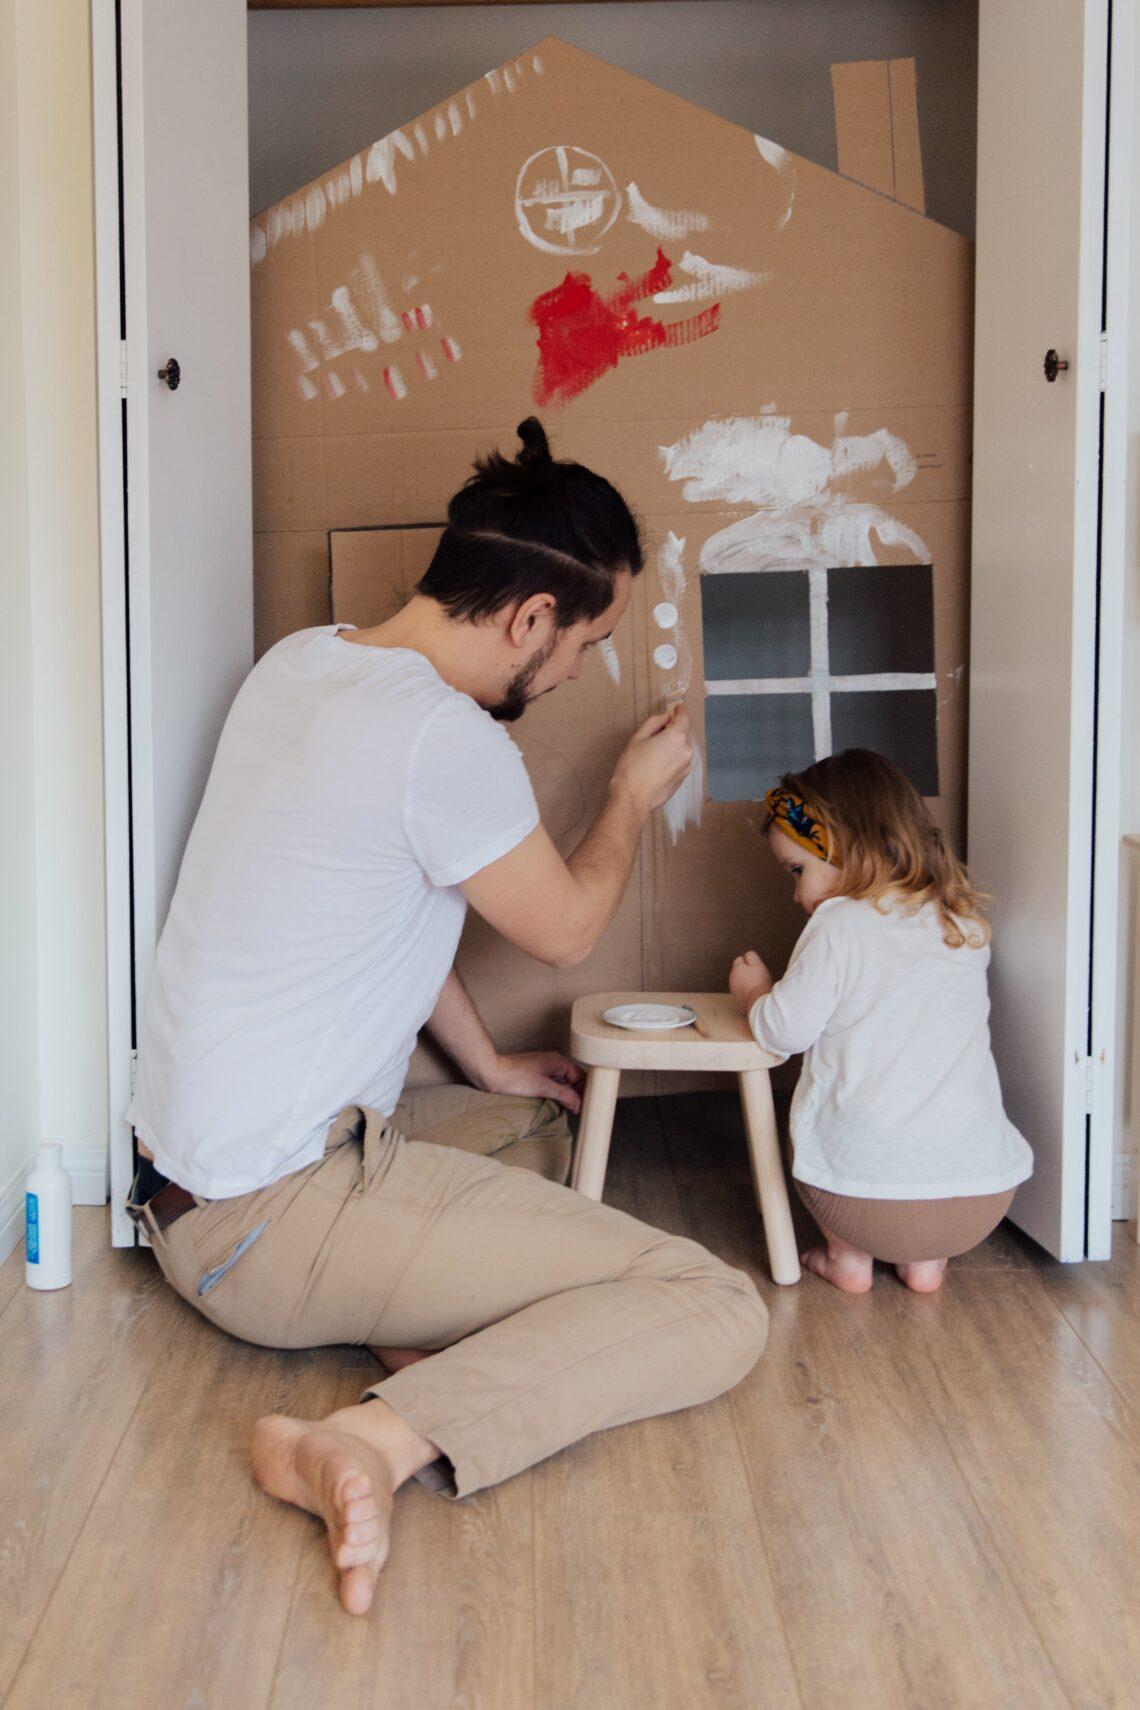 liknologio-dad-and-kid-paint